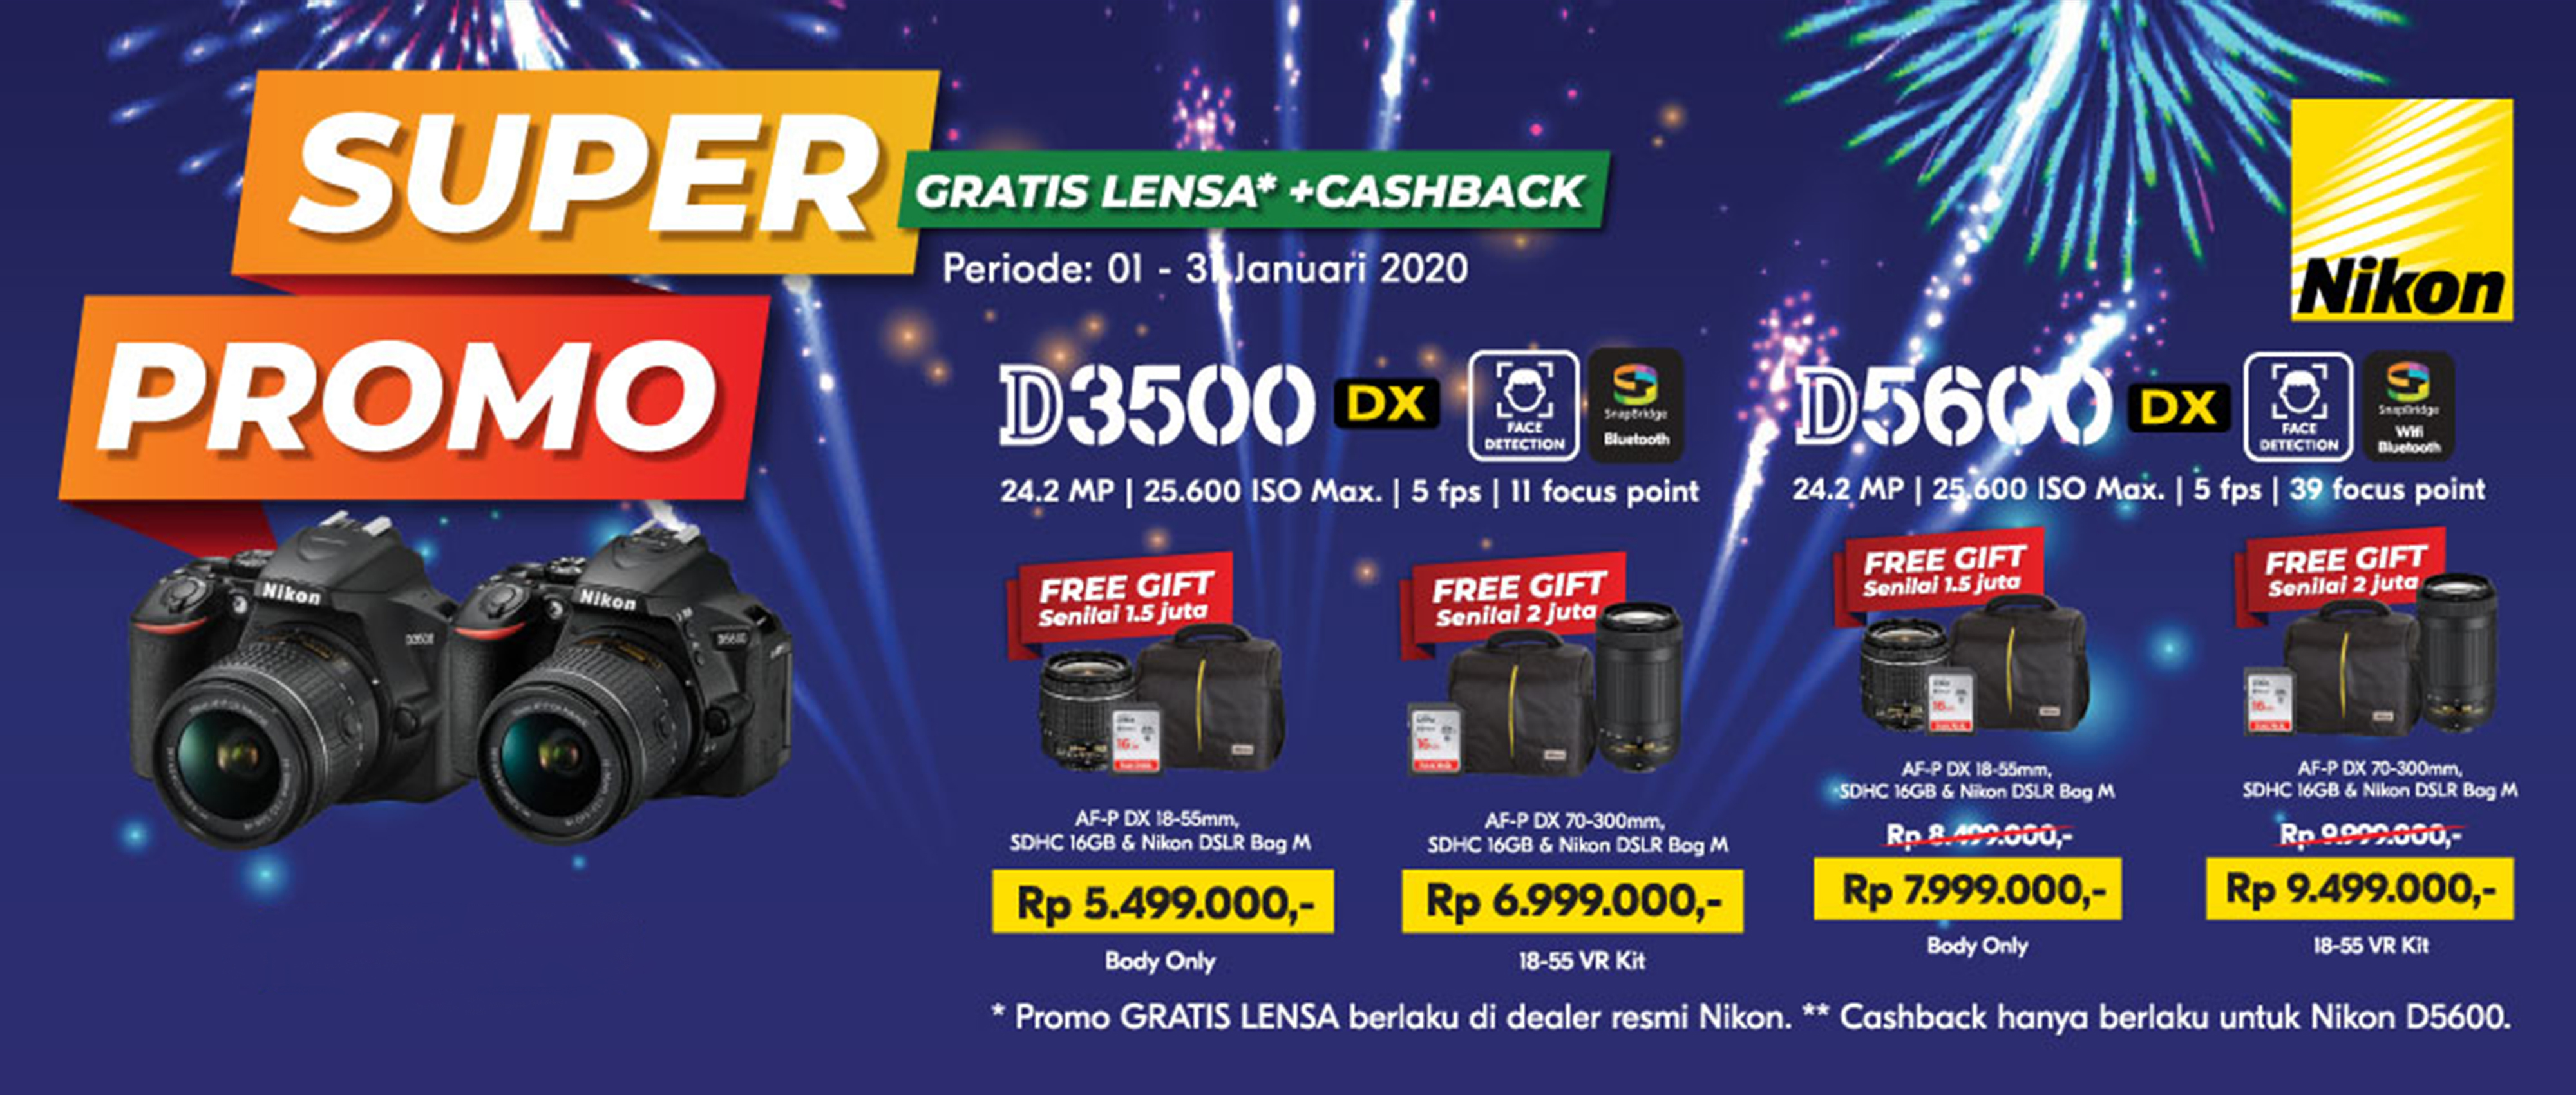 Promo Nikon D3500 and Nikon D5600